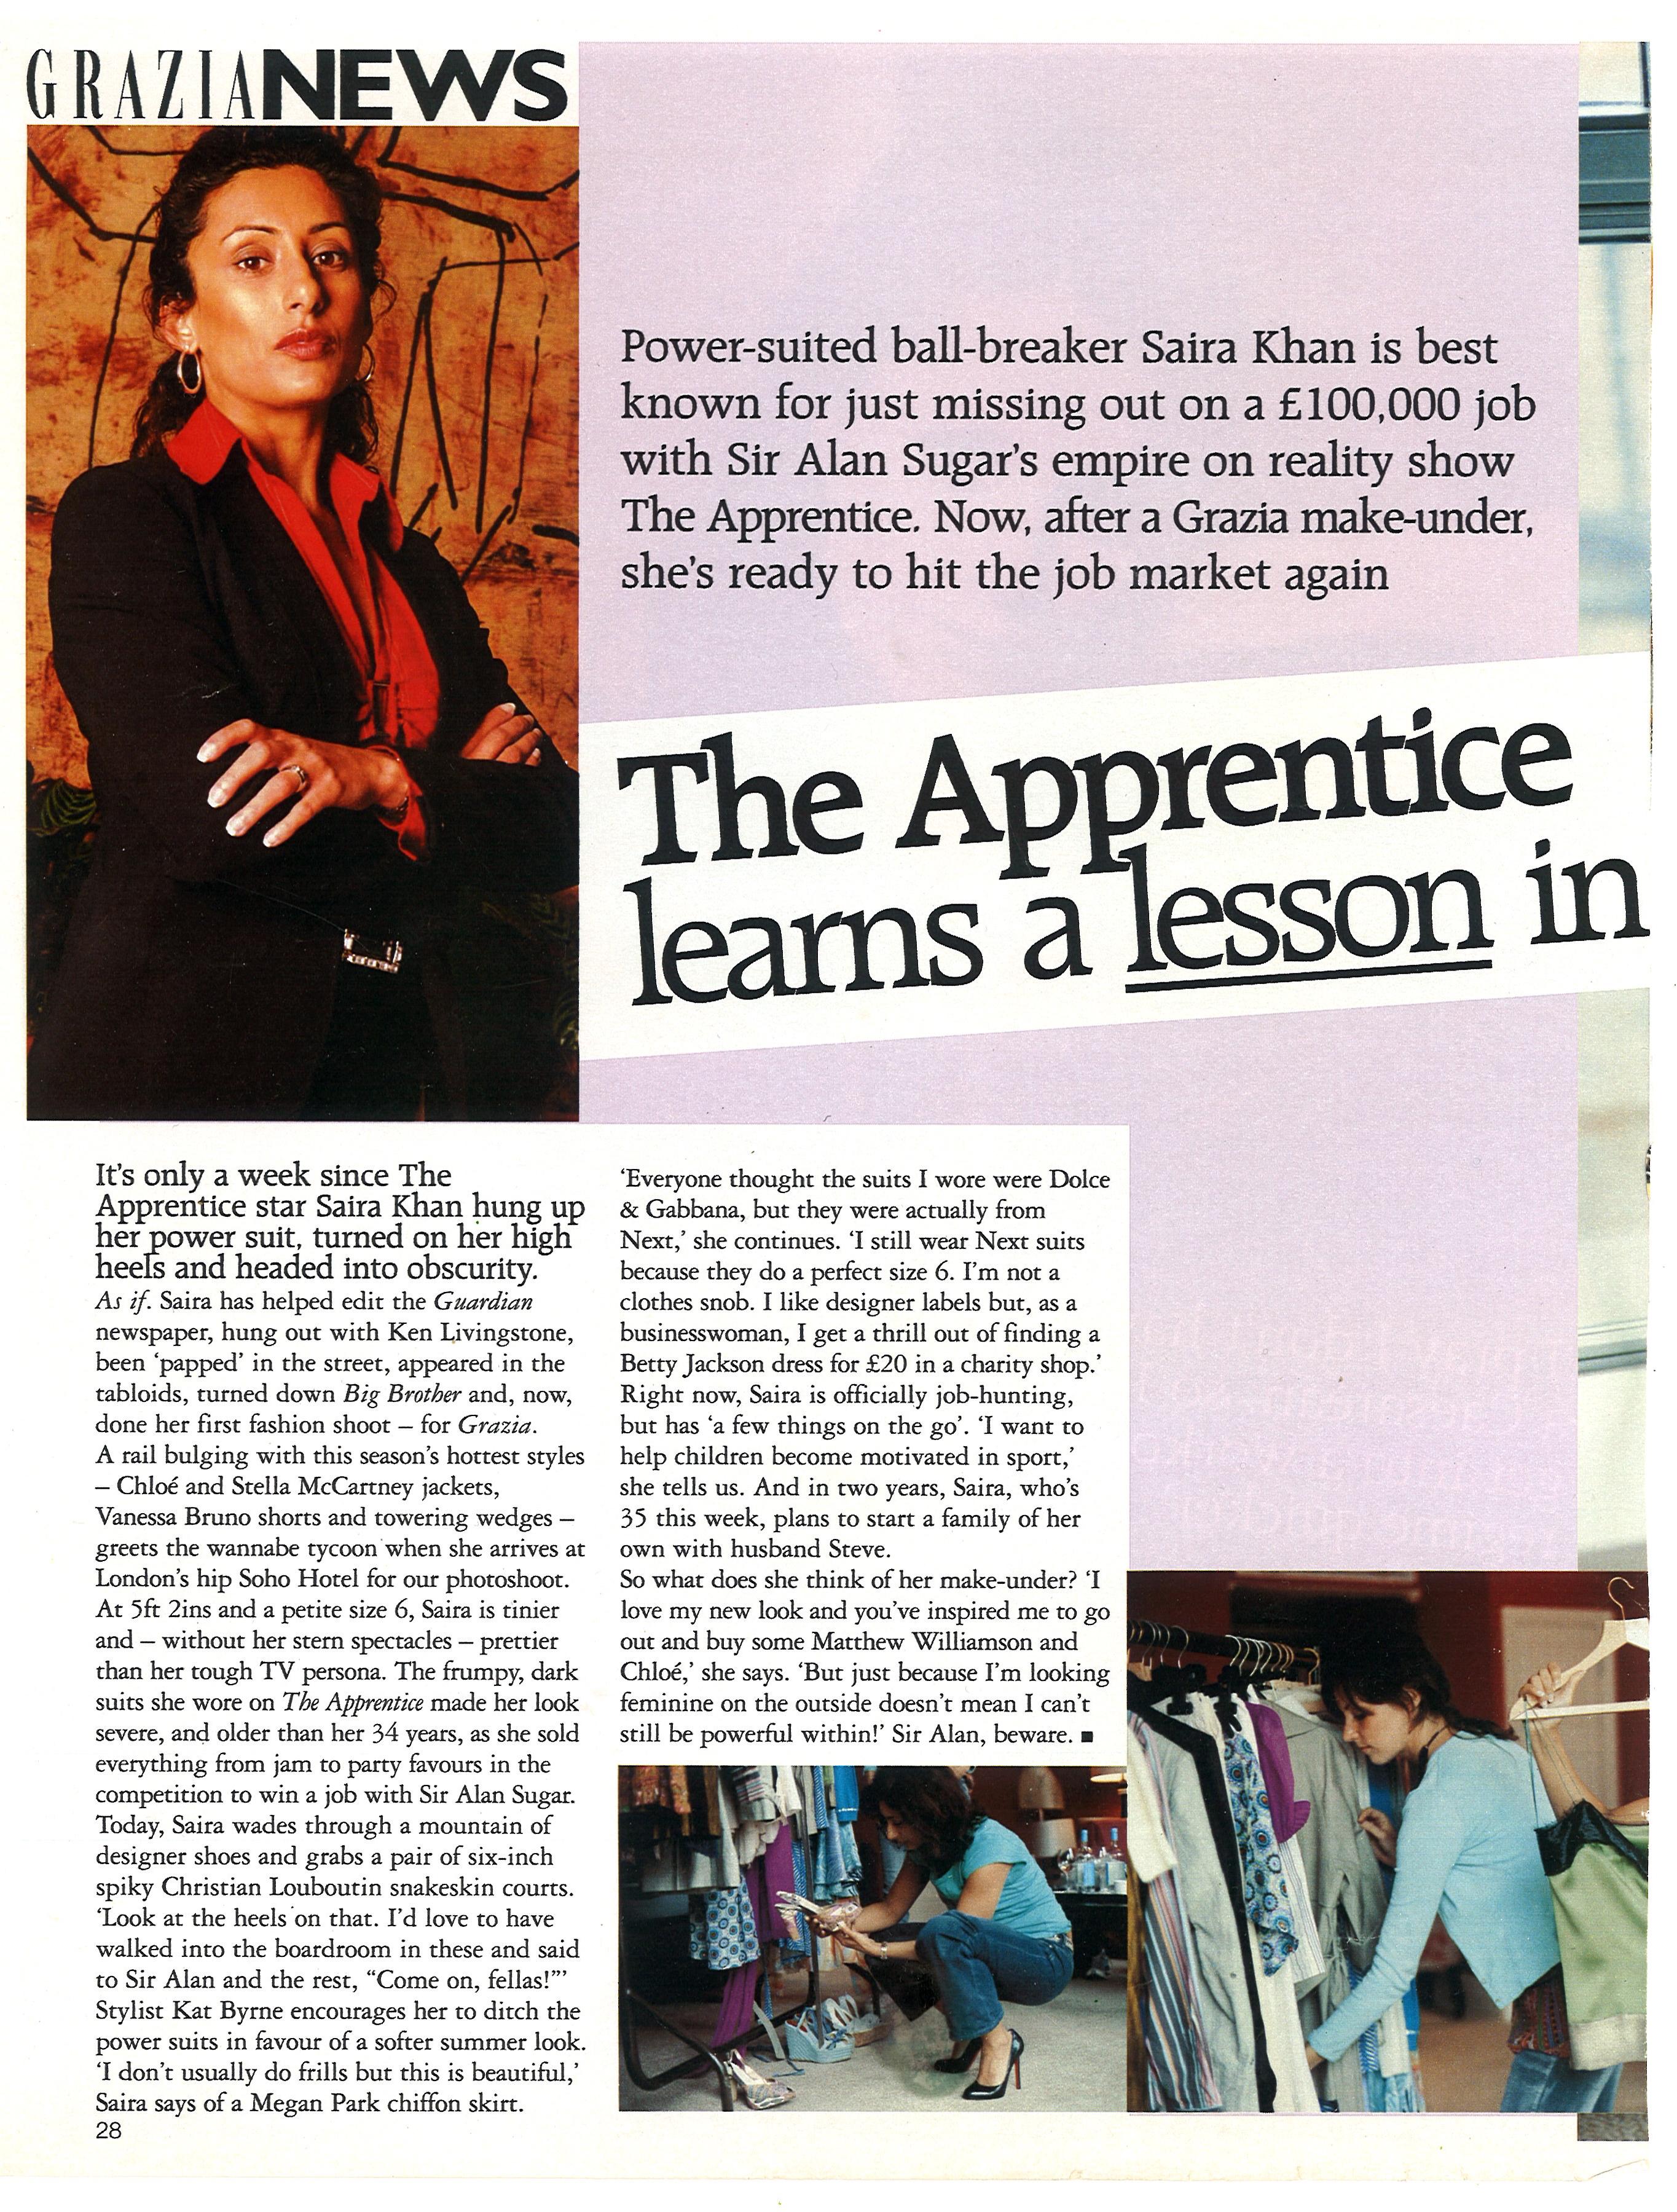 Julia-Robson-Saira-Khan-The-Apprentice-Grazia-2007-1(of2)